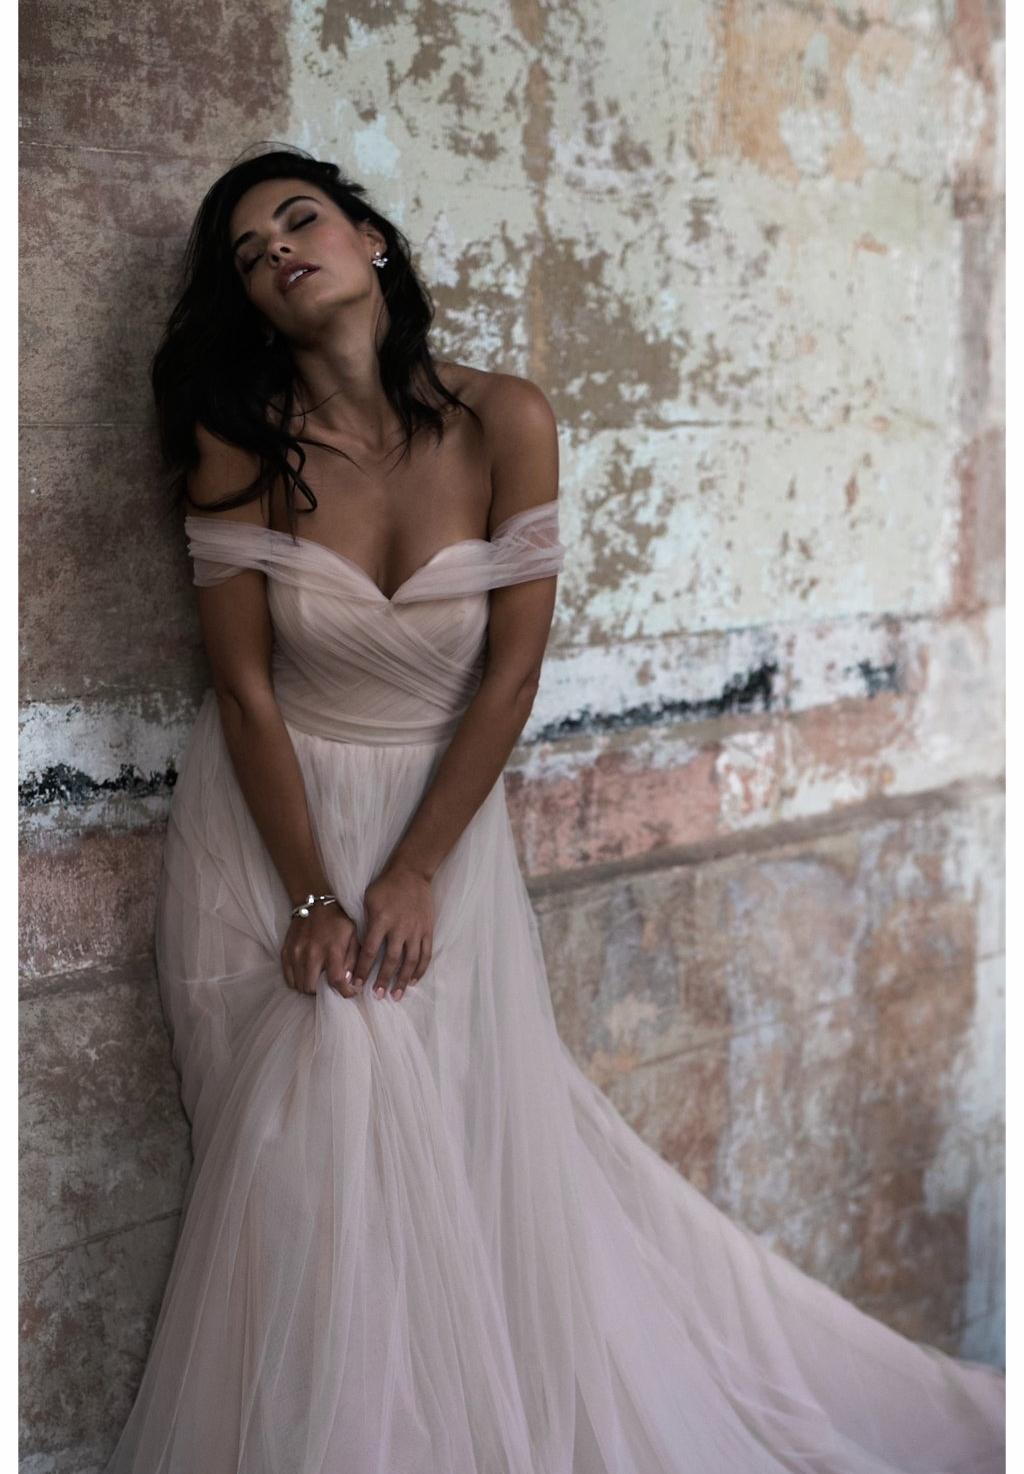 moira hughes couture wedding dress marella bridal sydney.jpg